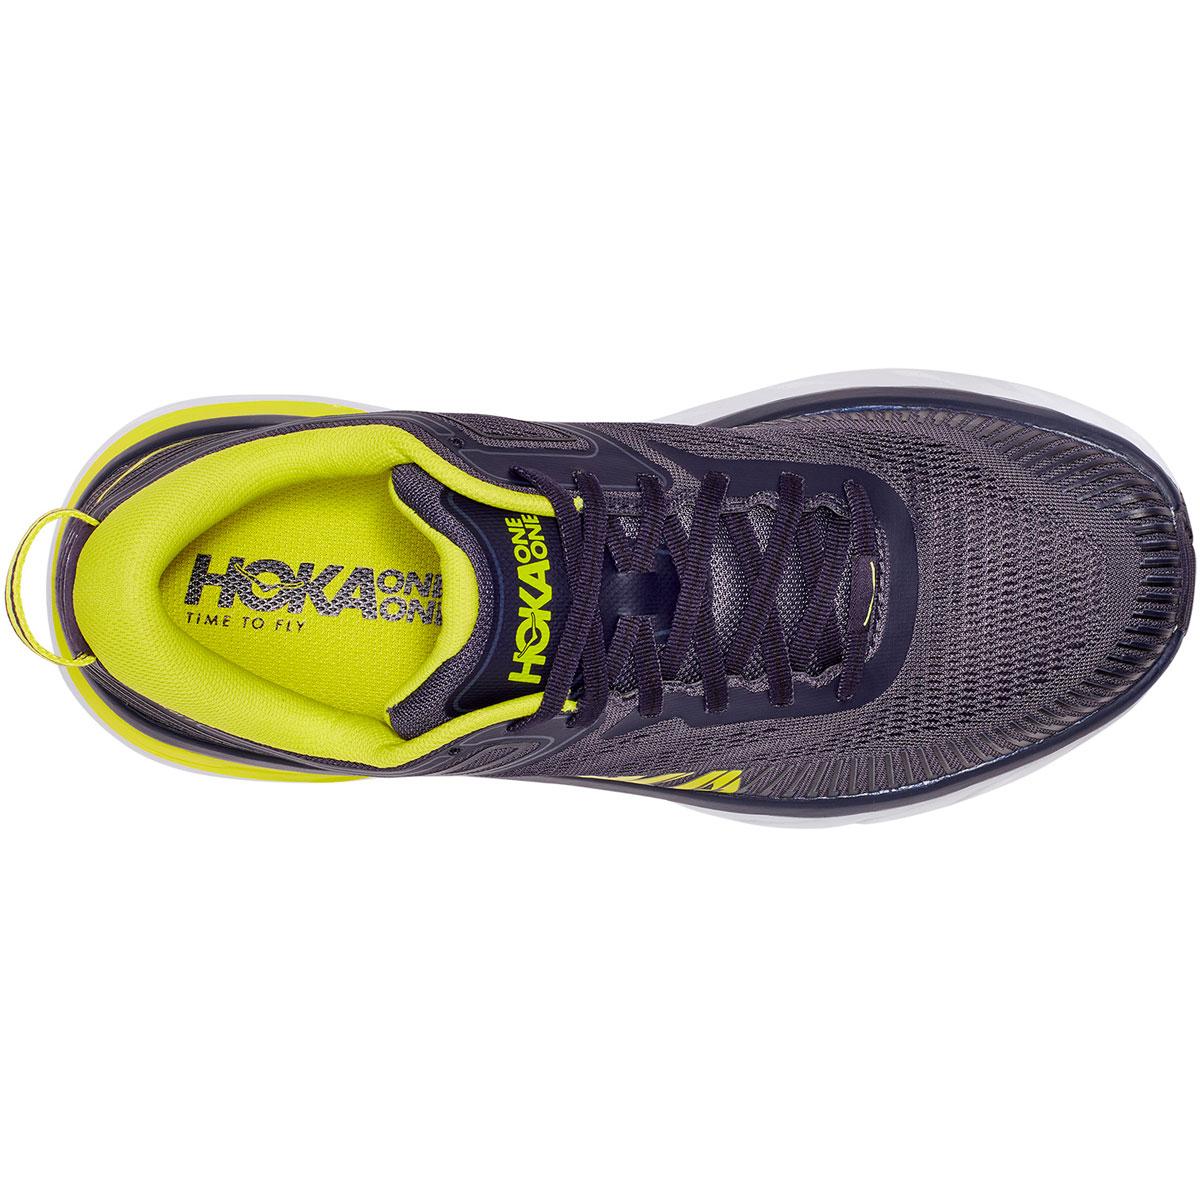 Men's Hoka One One Bondi 7 Running Shoe - Color: Odyssey Grey/Deep Well - Size: 7 - Width: Regular, Odyssey Grey/Deep Well, large, image 2